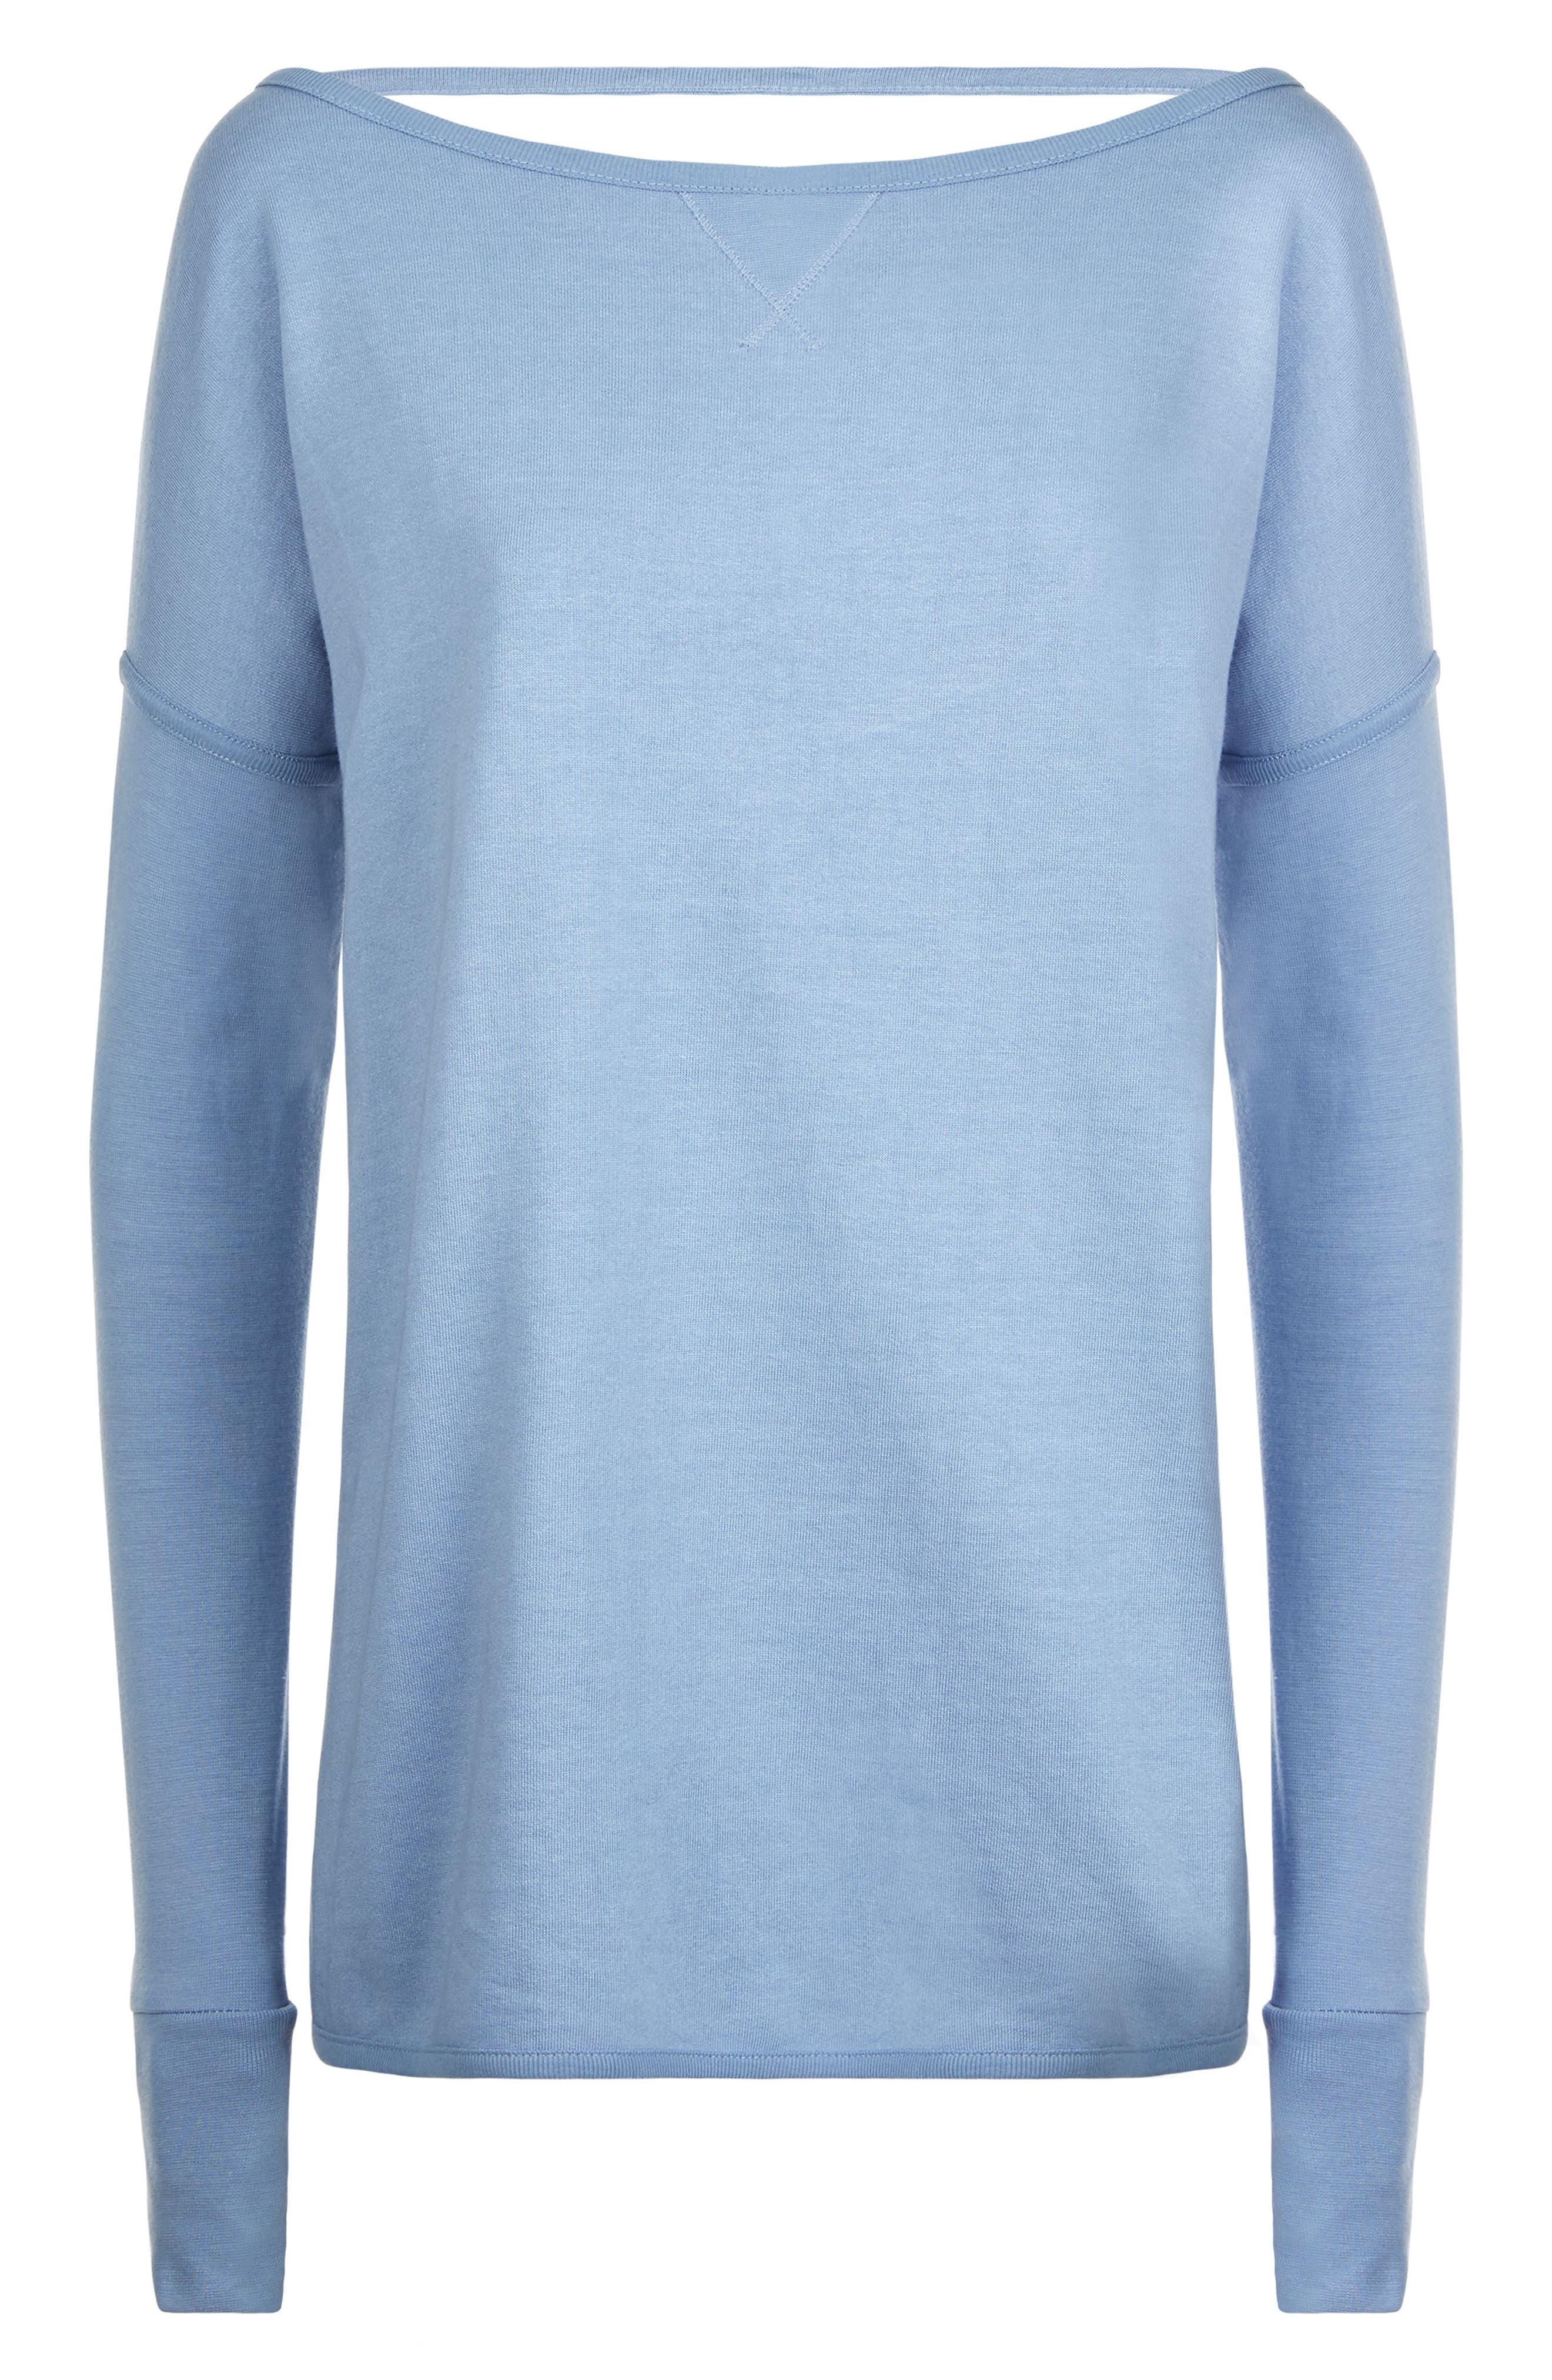 Simhasana Sport Sweatshirt,                             Alternate thumbnail 6, color,                             Faded Denim